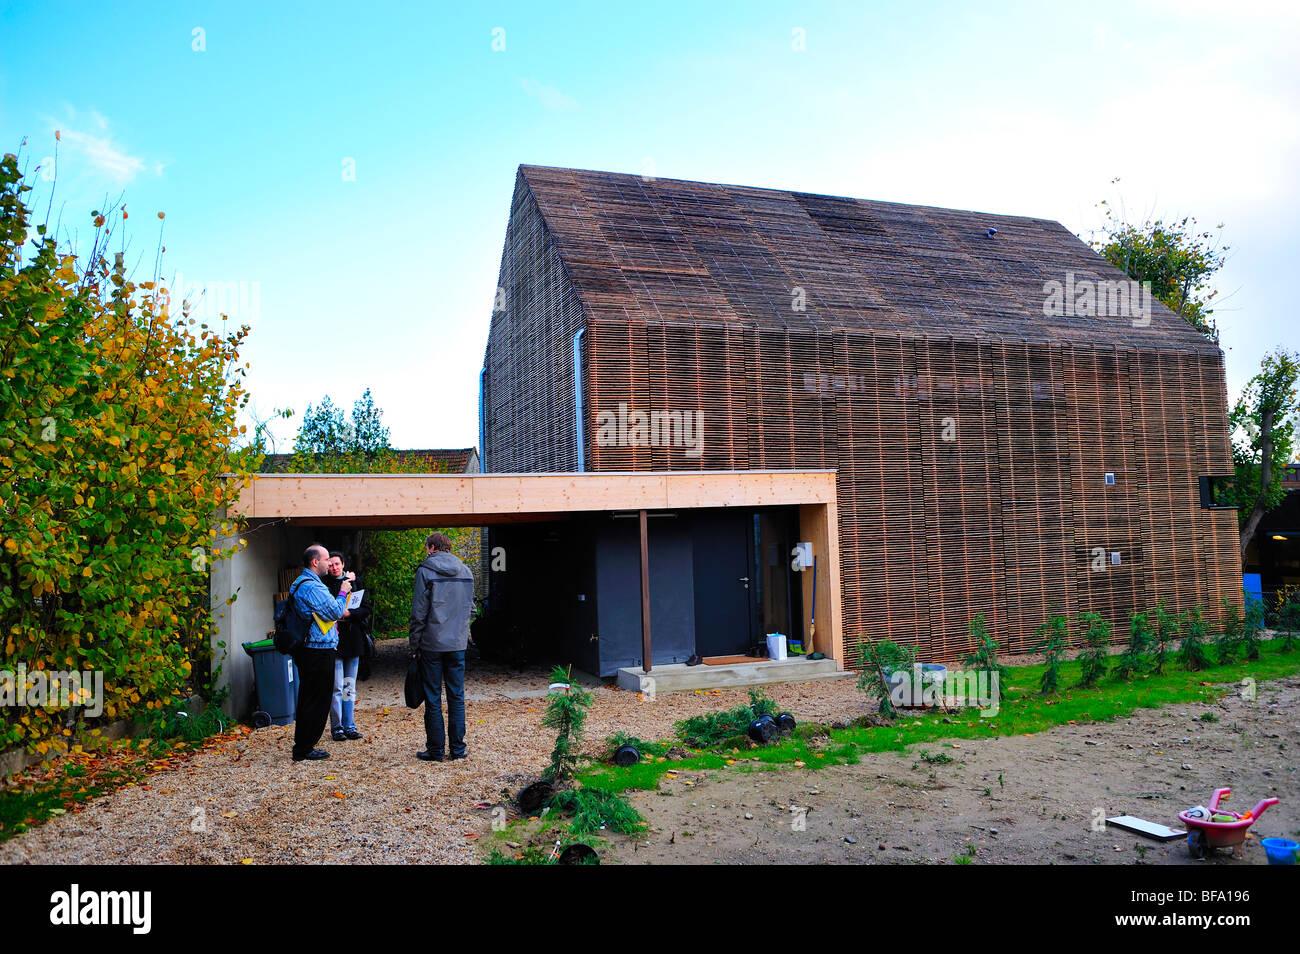 France, Green House, Zero Energy Consumption,'Passive House' 'Maison Passive',eco house, outside - Stock Image